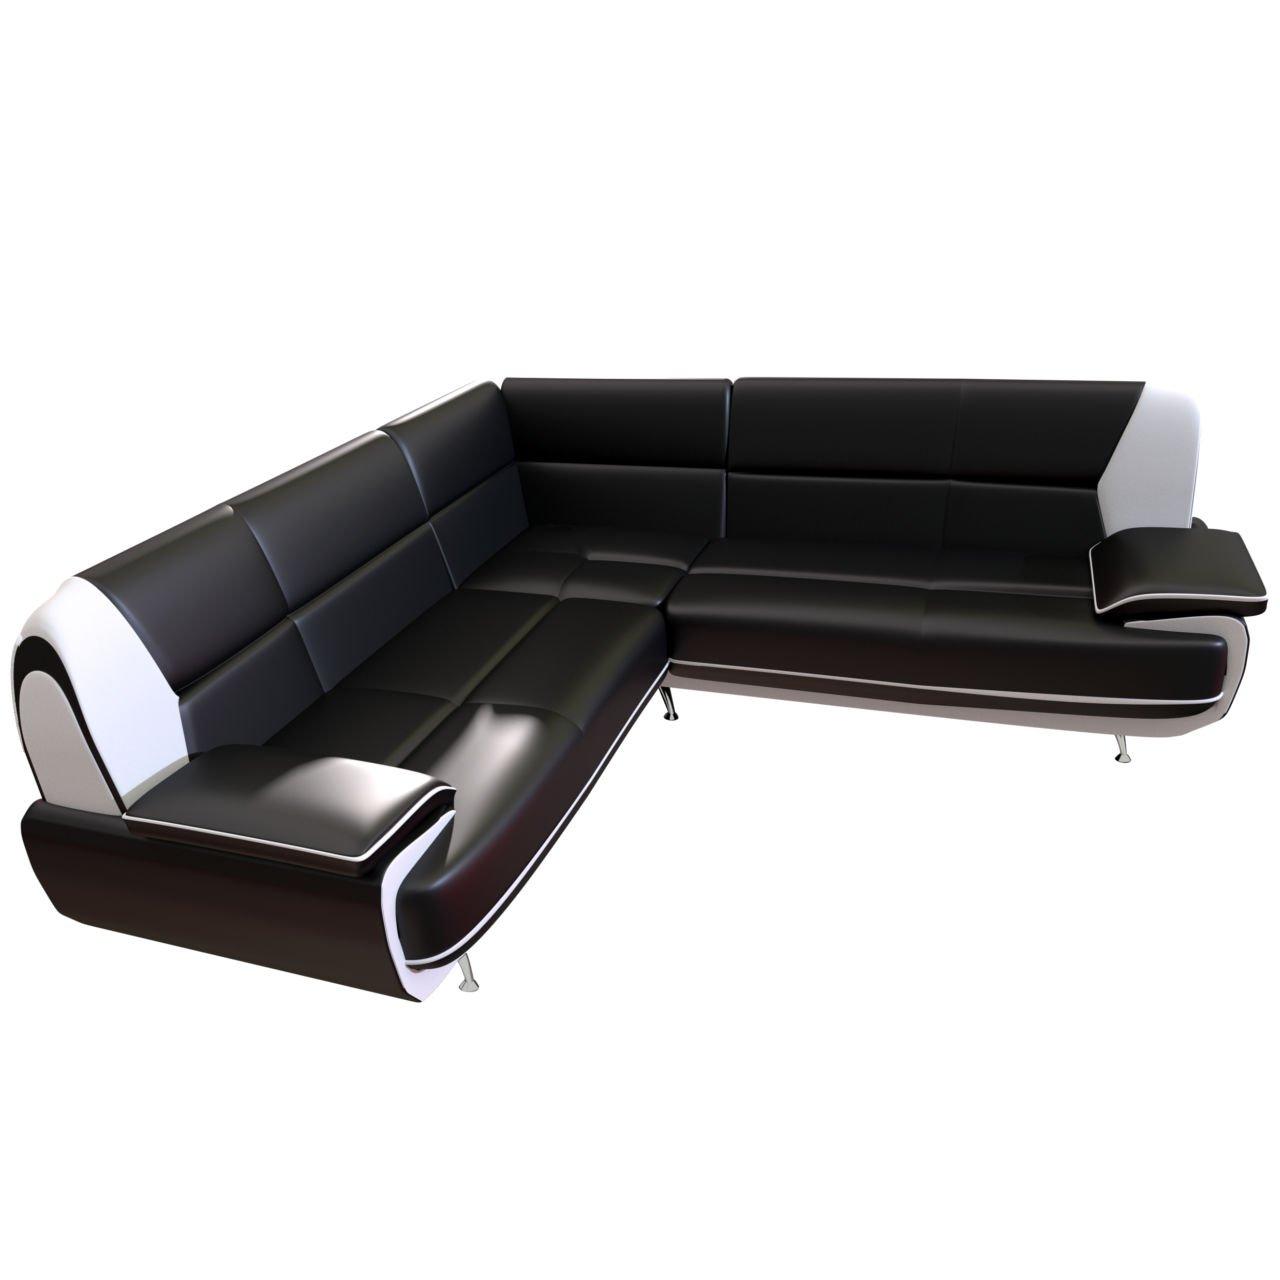 Design Ecksofa Palermo Maxi Couchgarnitur Freistehendes